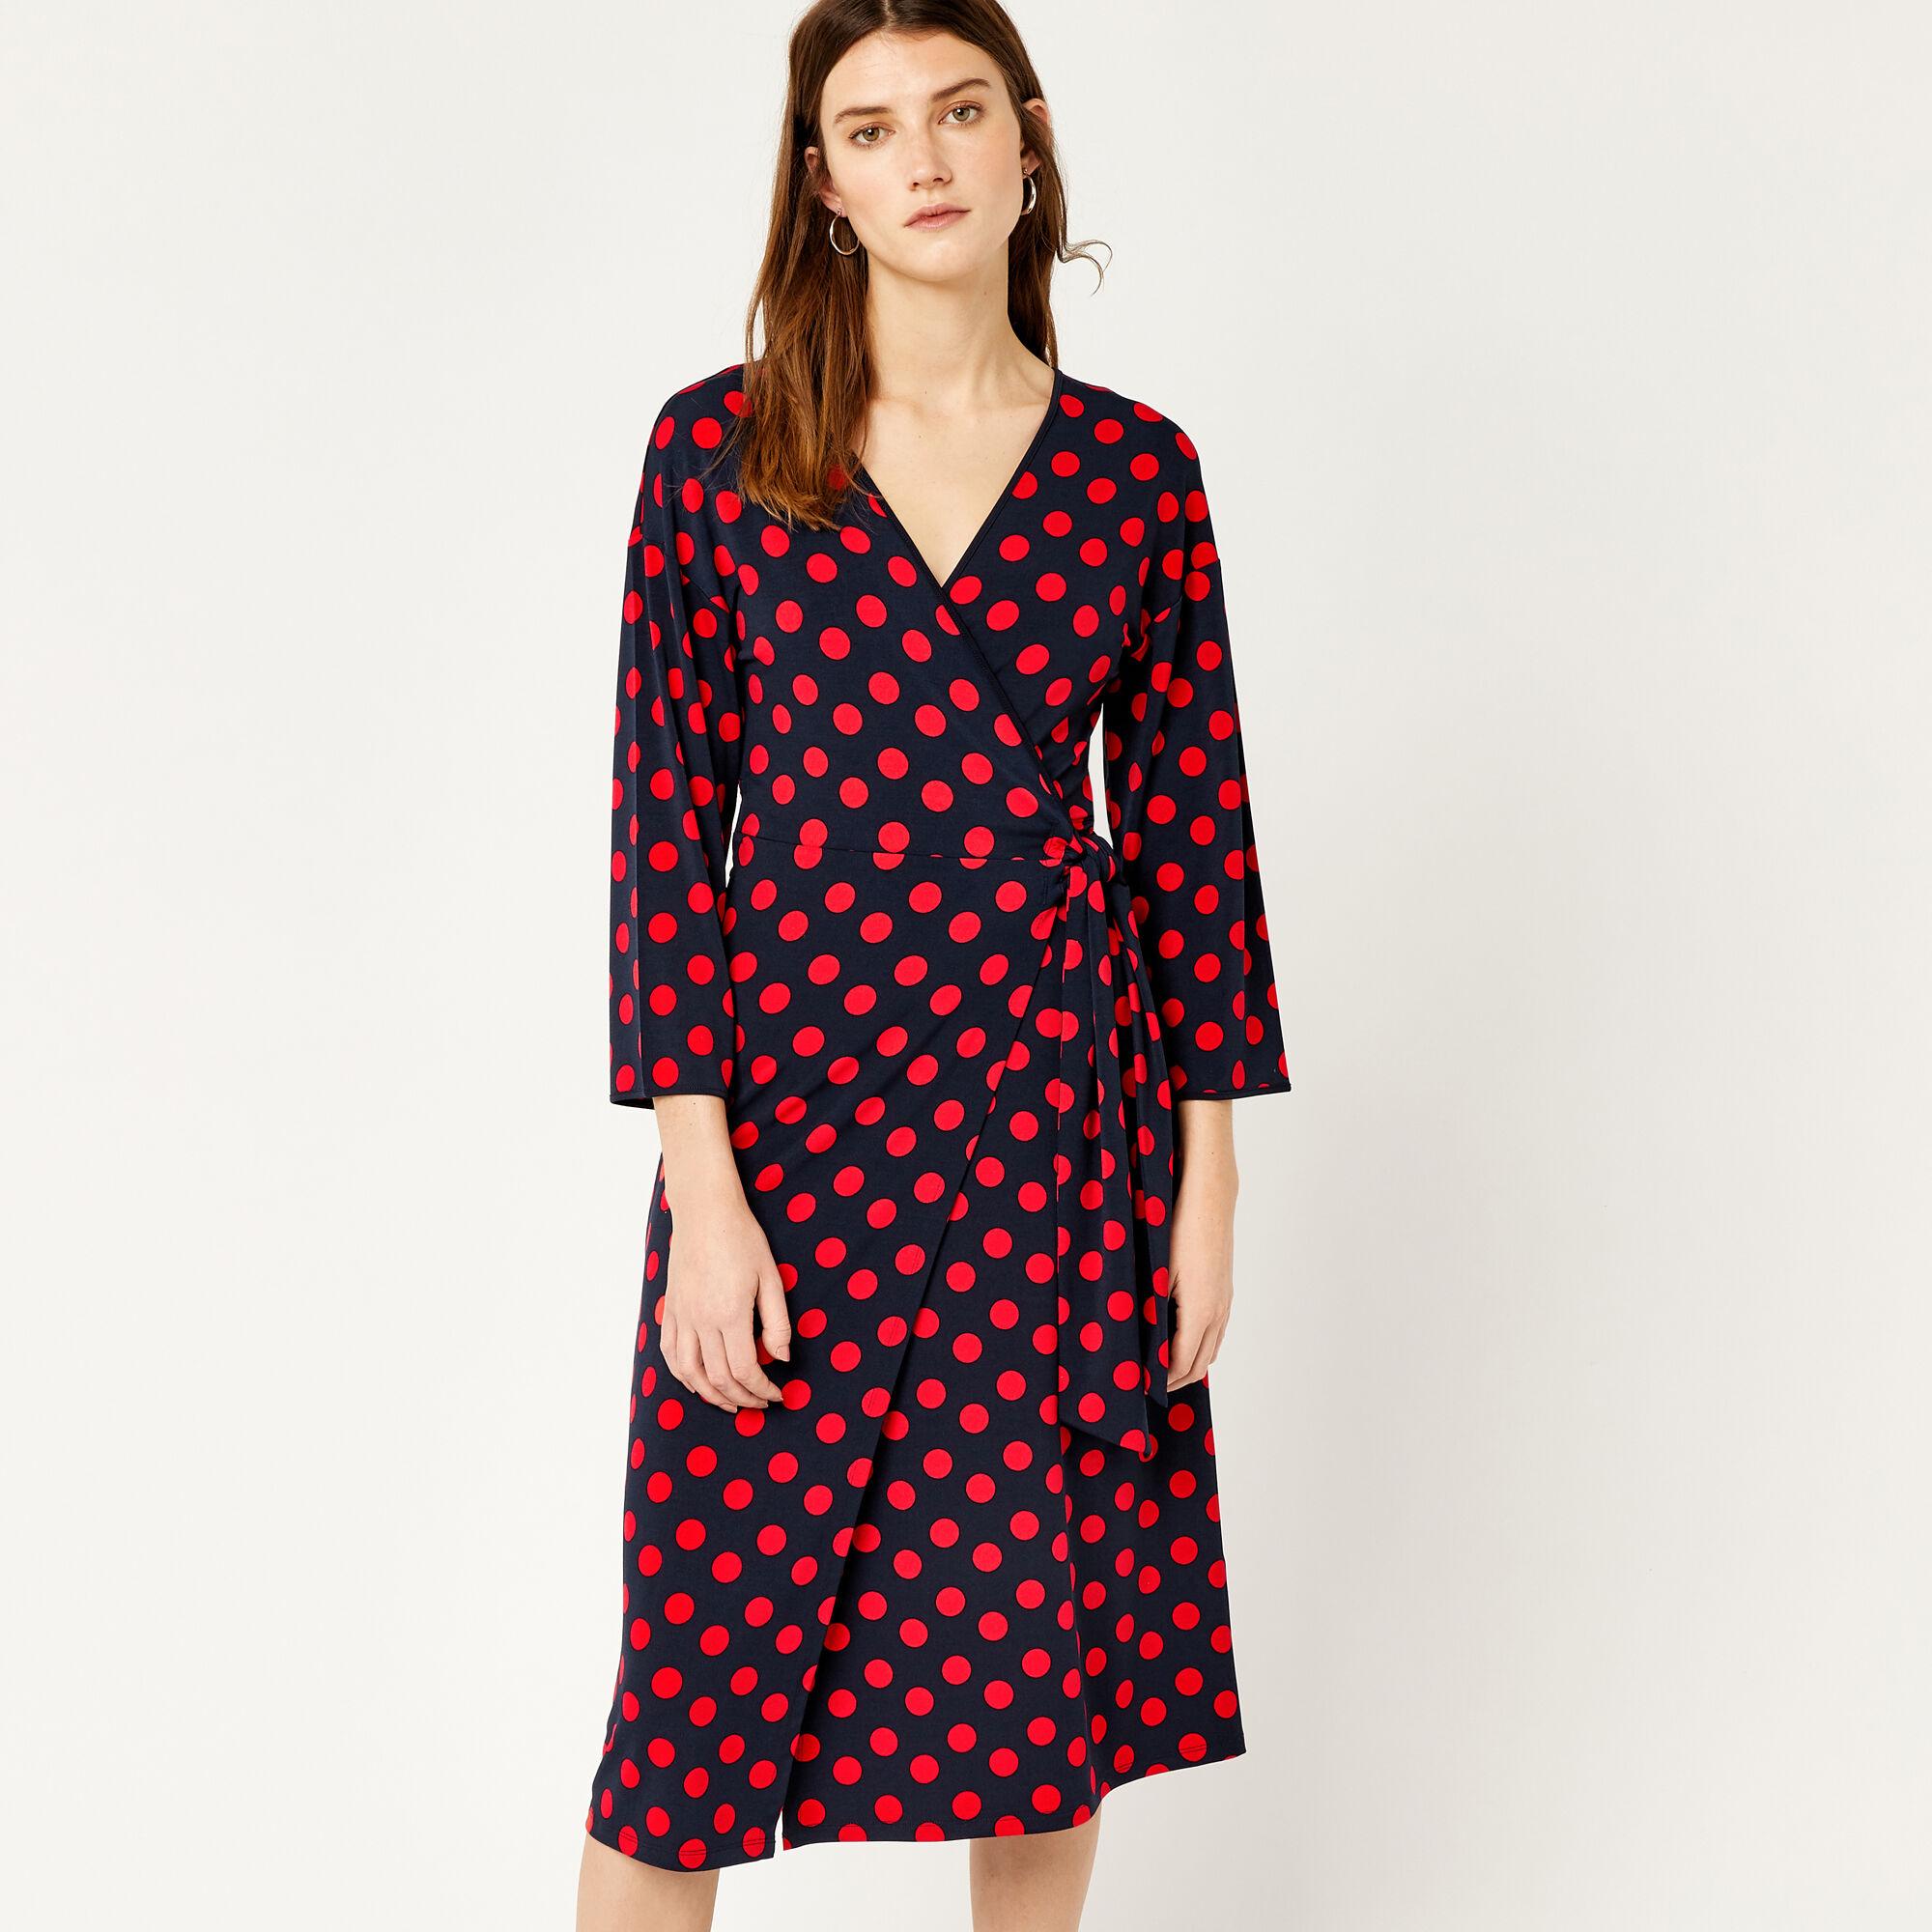 Express wrap dress black and white leopard print